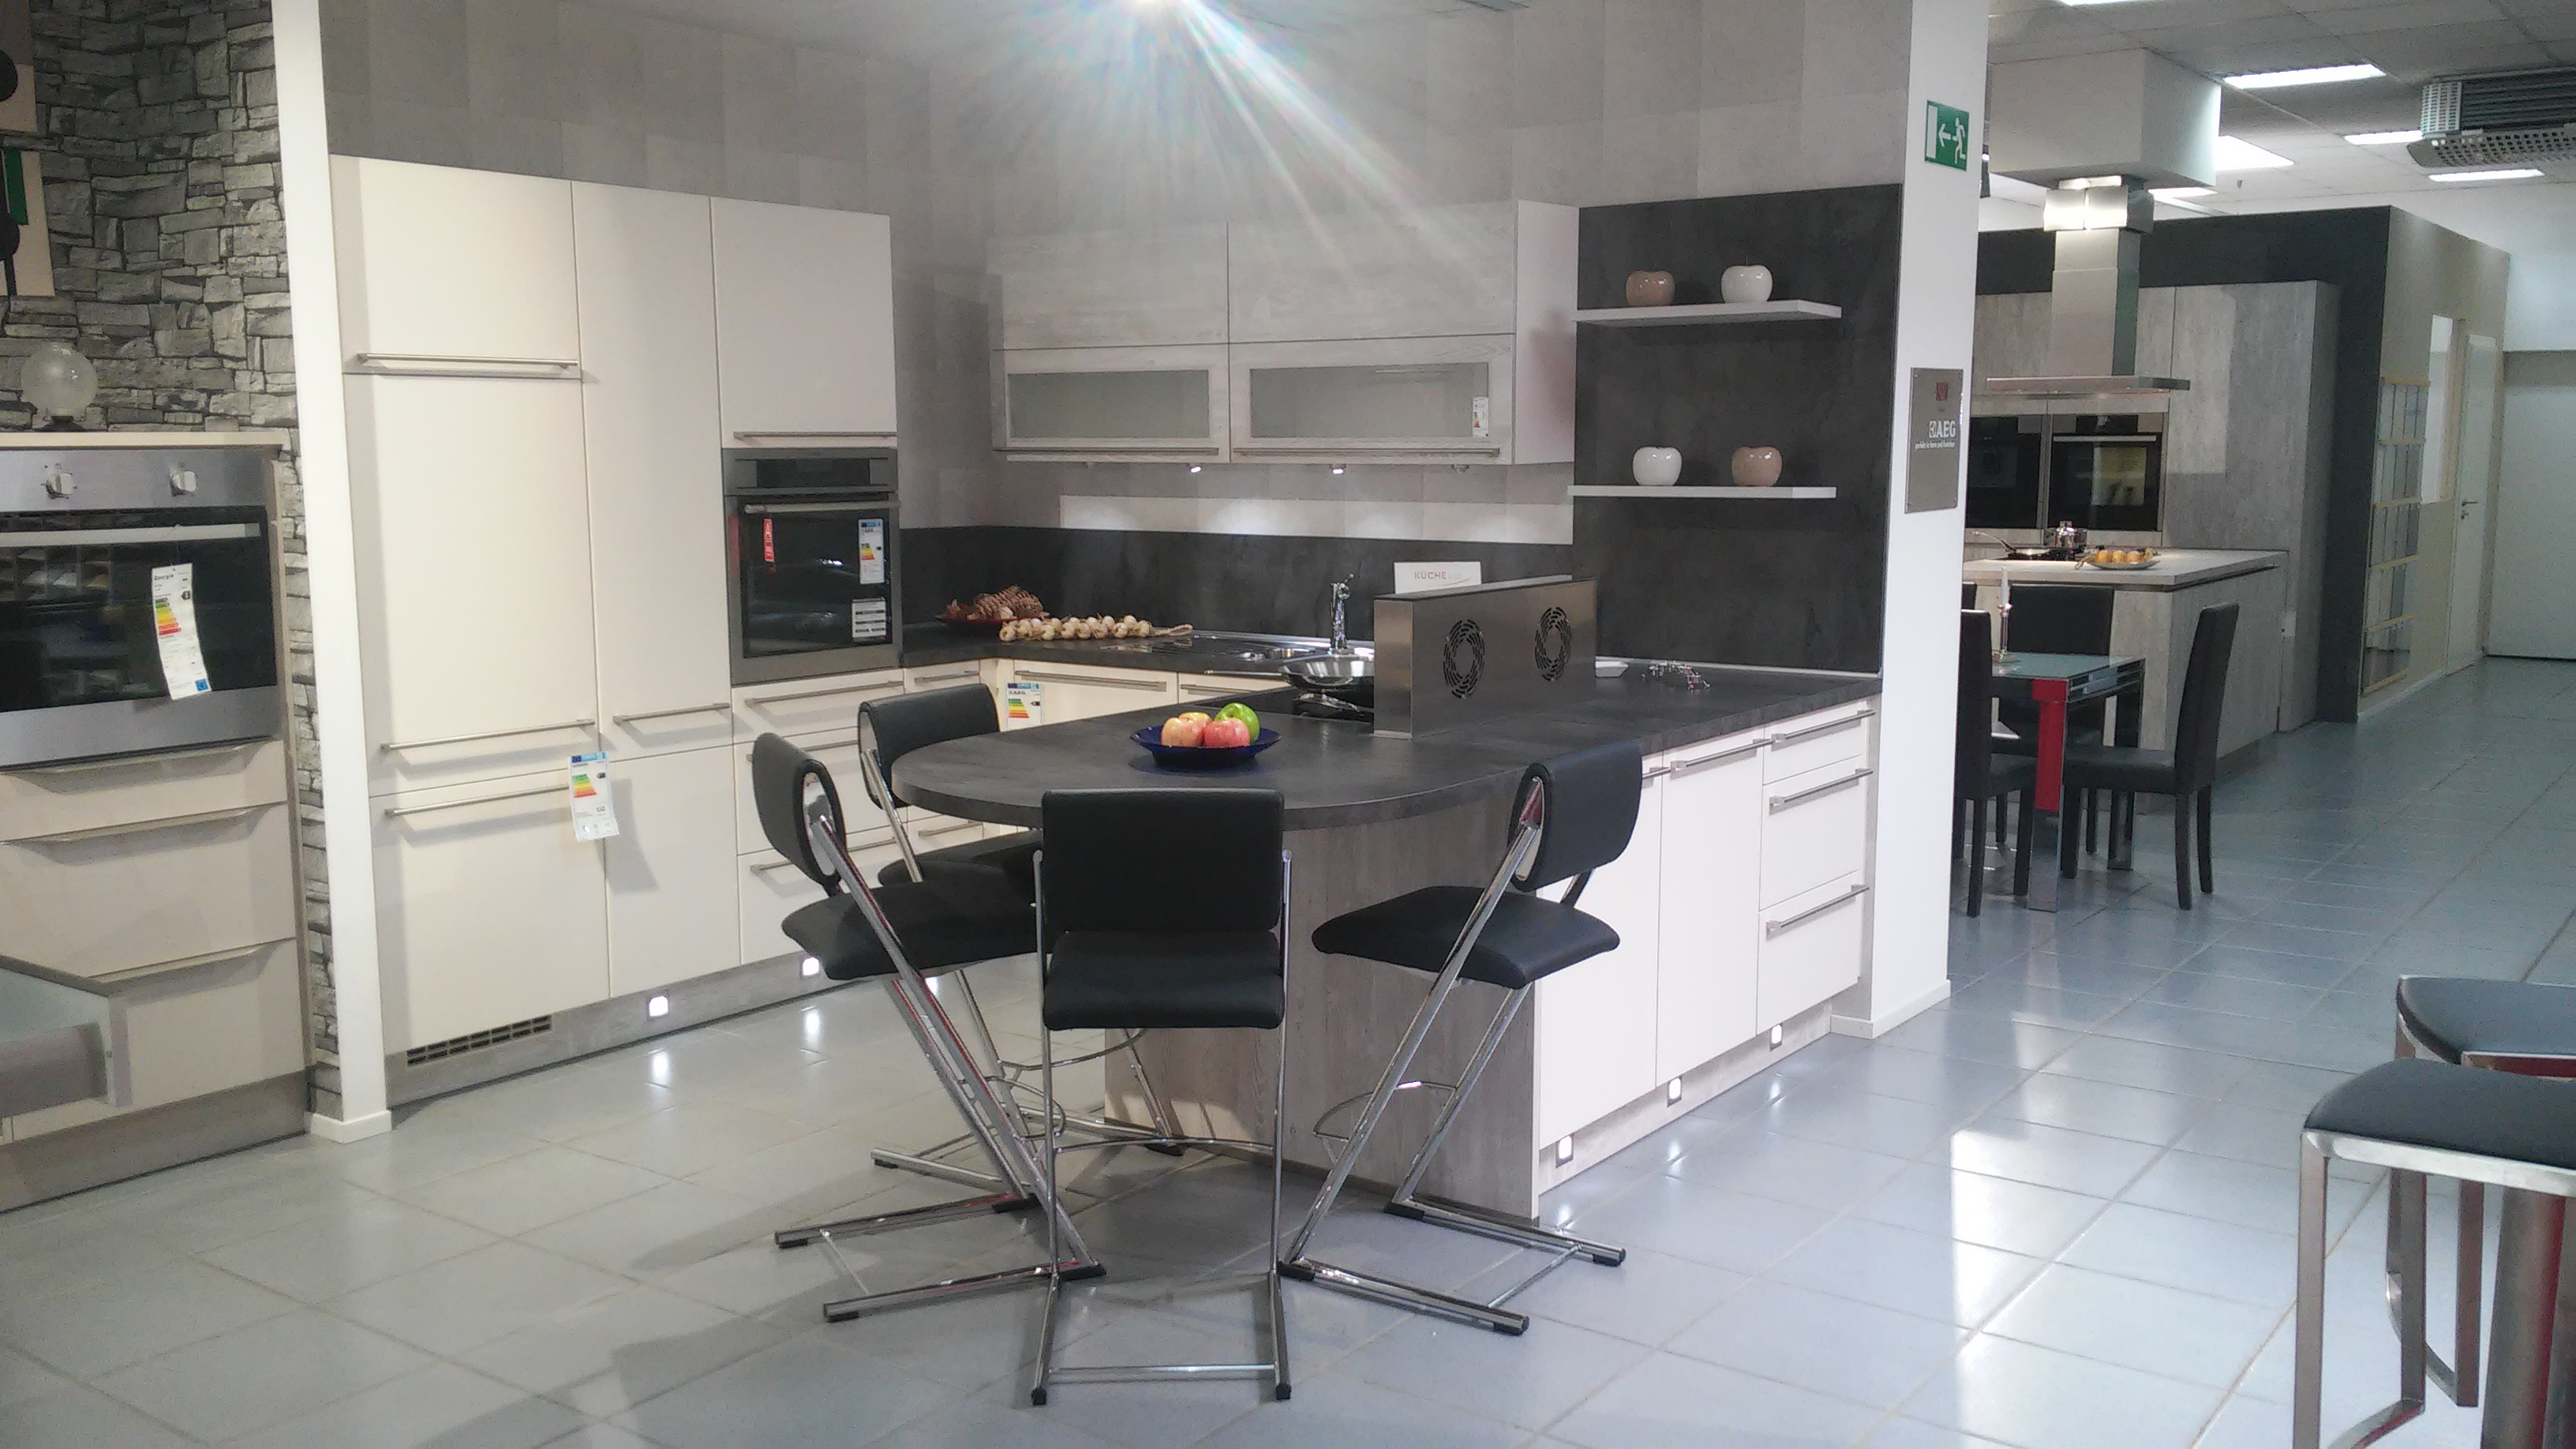 k che co kaiserslautern m bel kaiserslautern deutschland tel 063153448. Black Bedroom Furniture Sets. Home Design Ideas